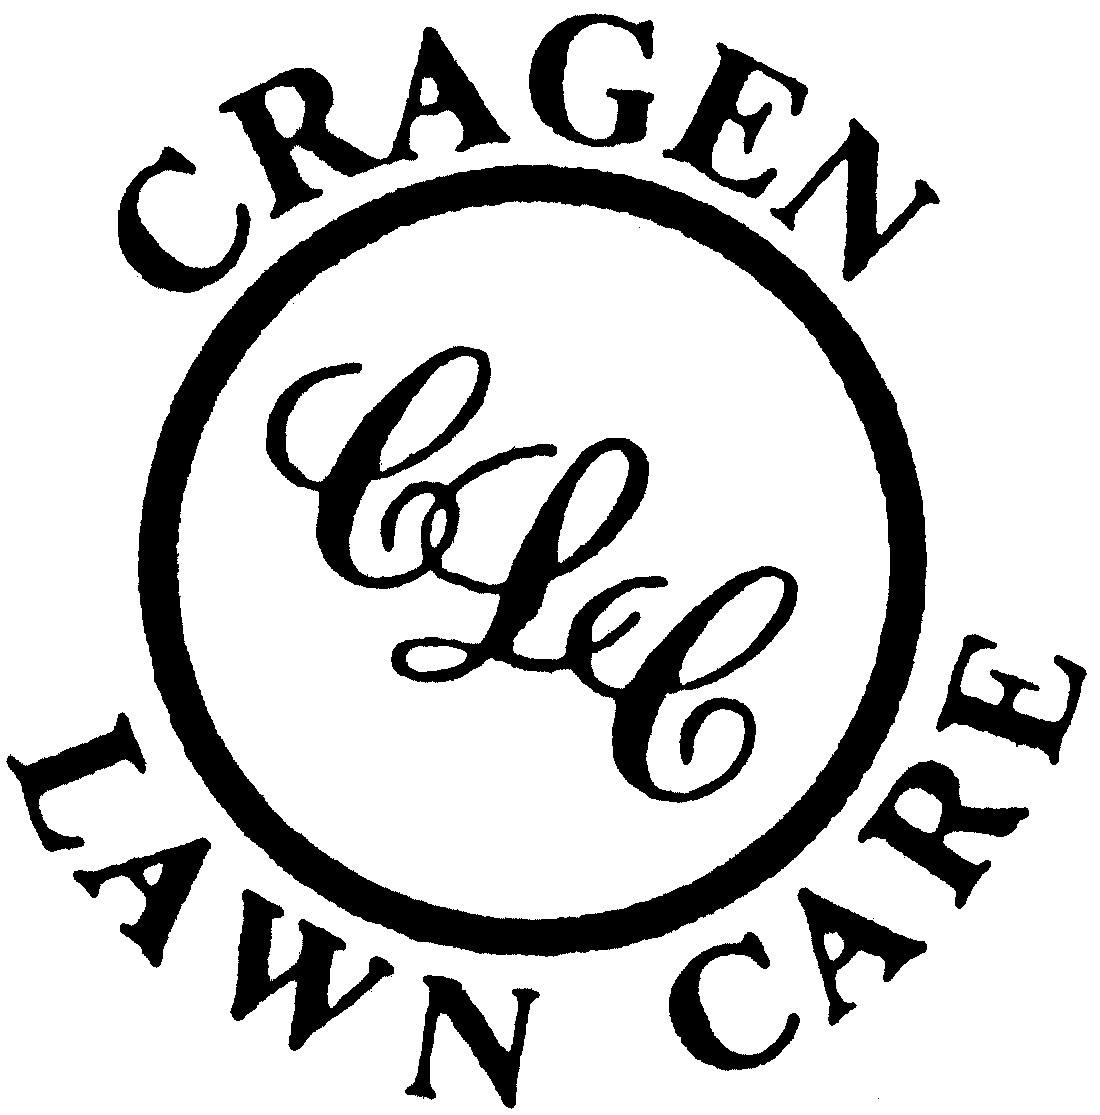 Cragen Lawn Care logo